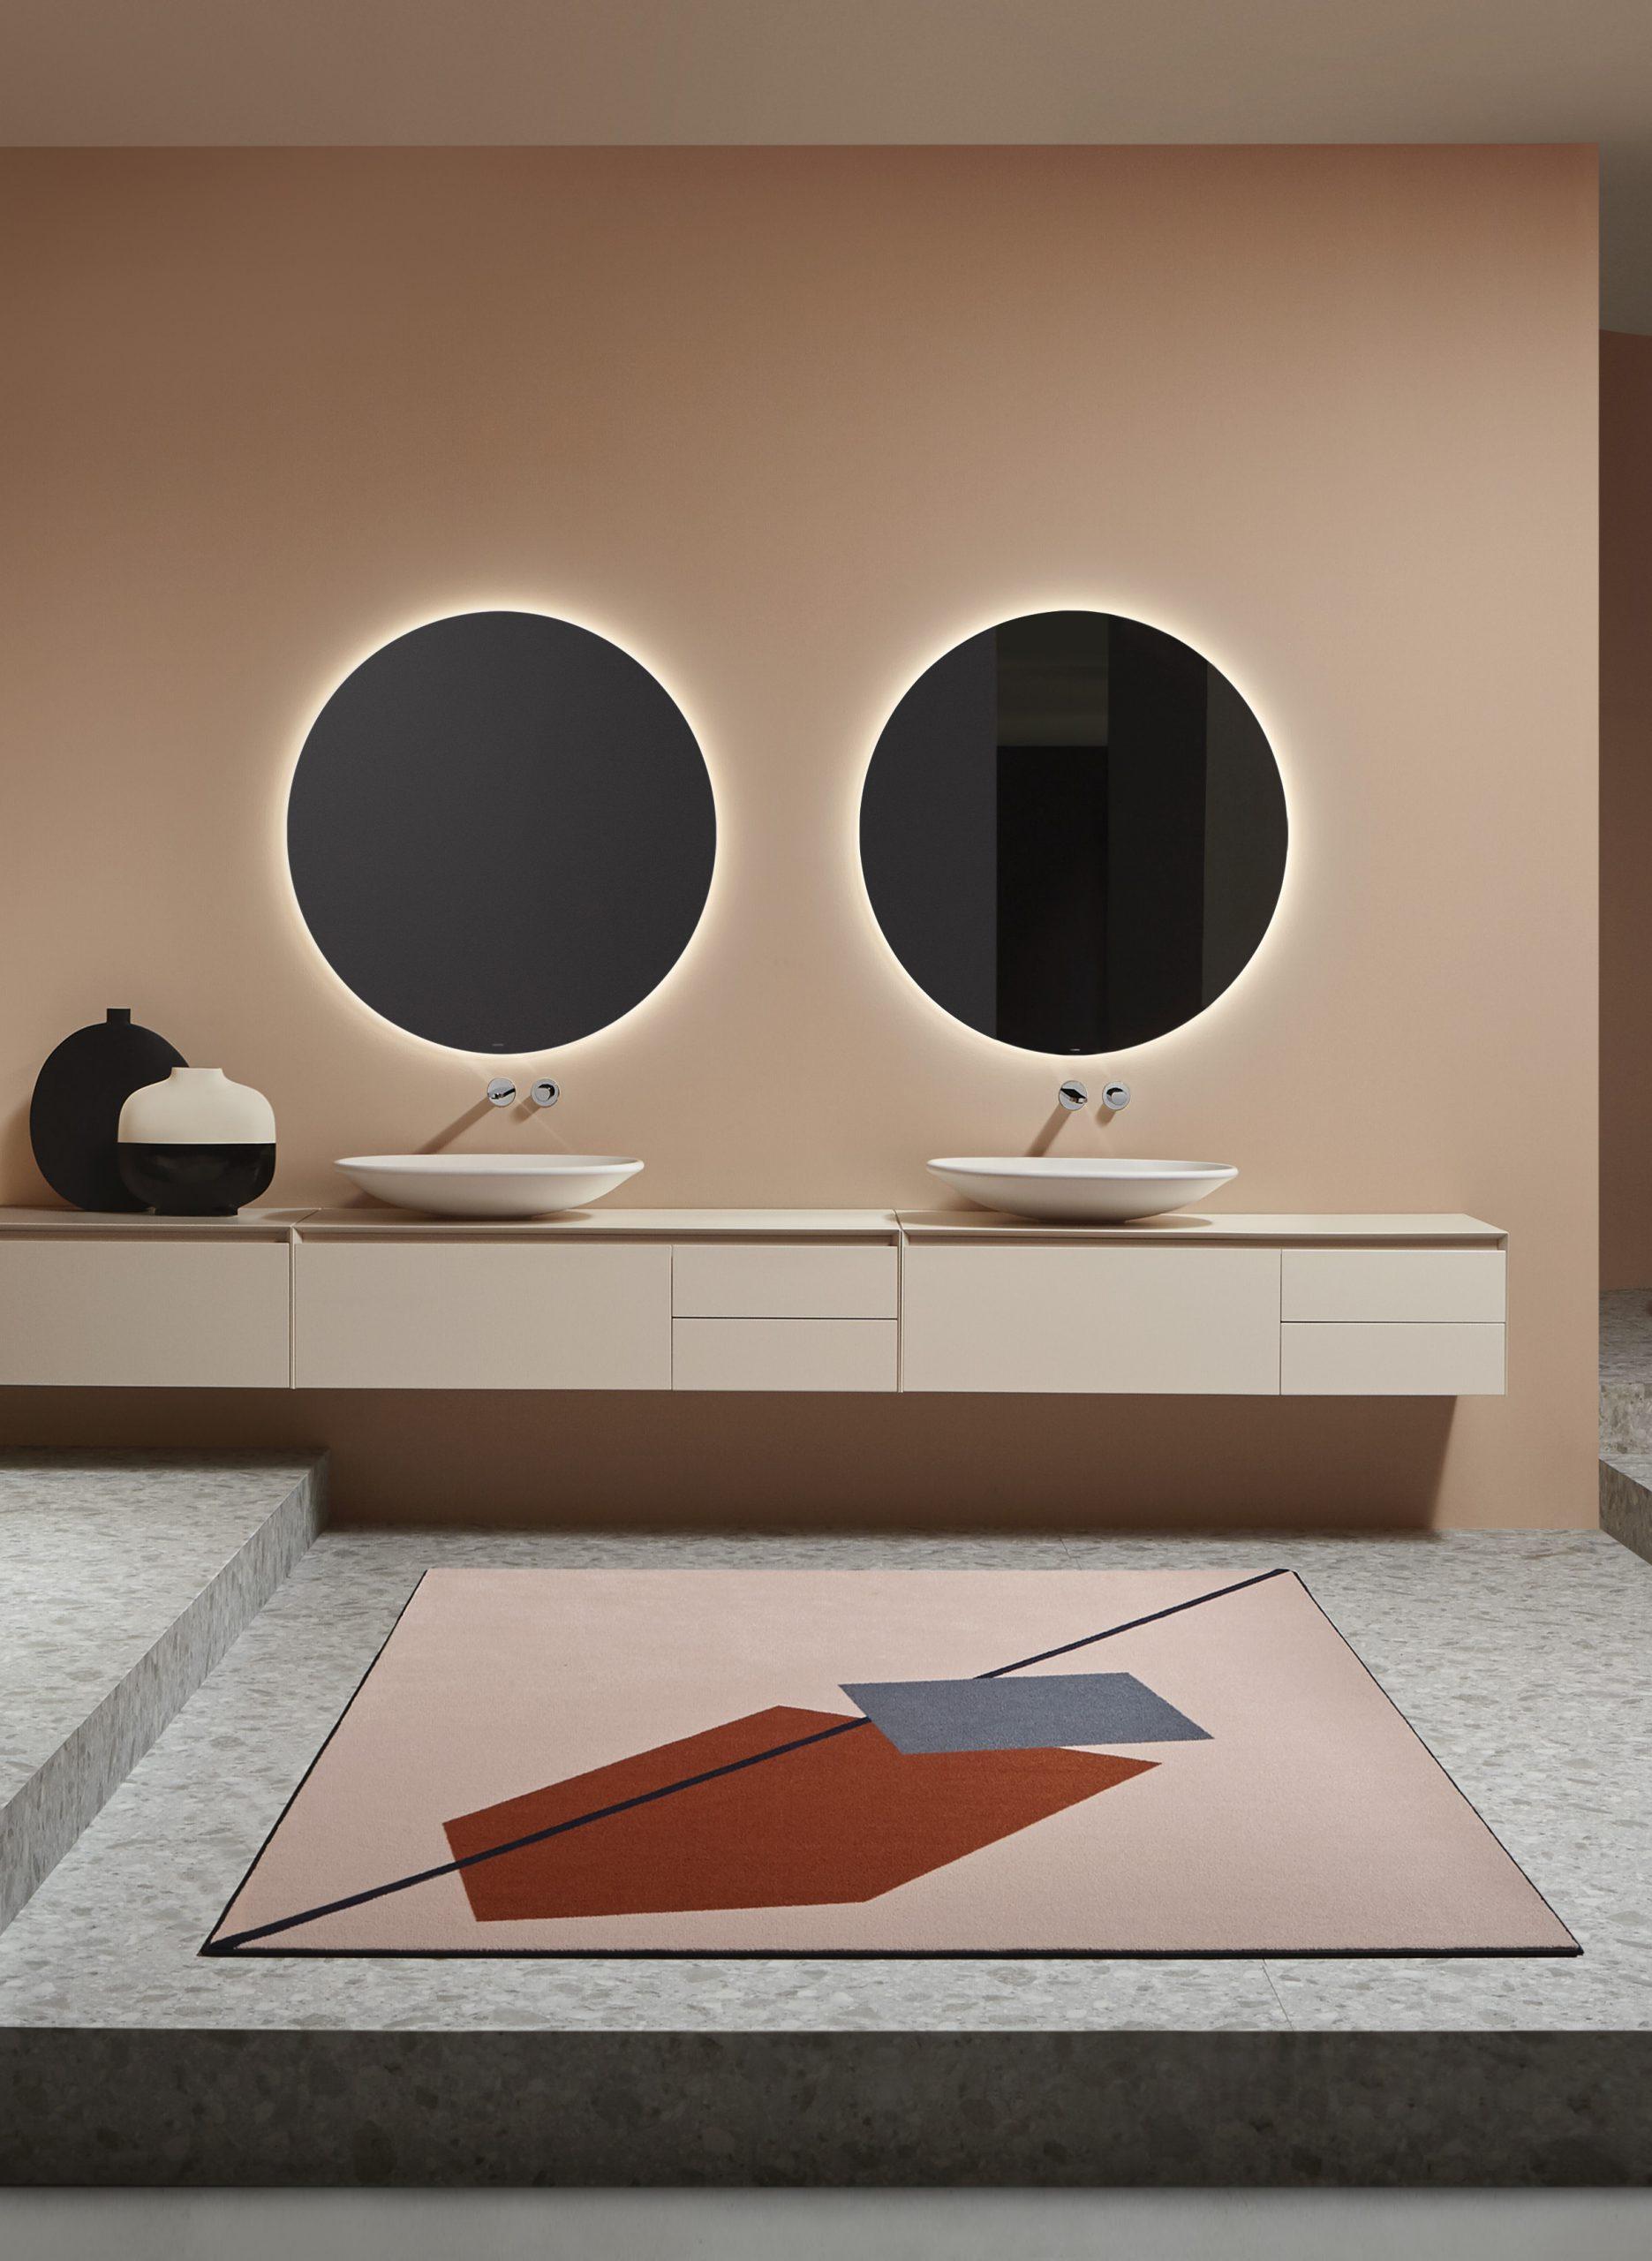 Interior with Rim washbowls by Debiasi Sandri for Antoniolupi